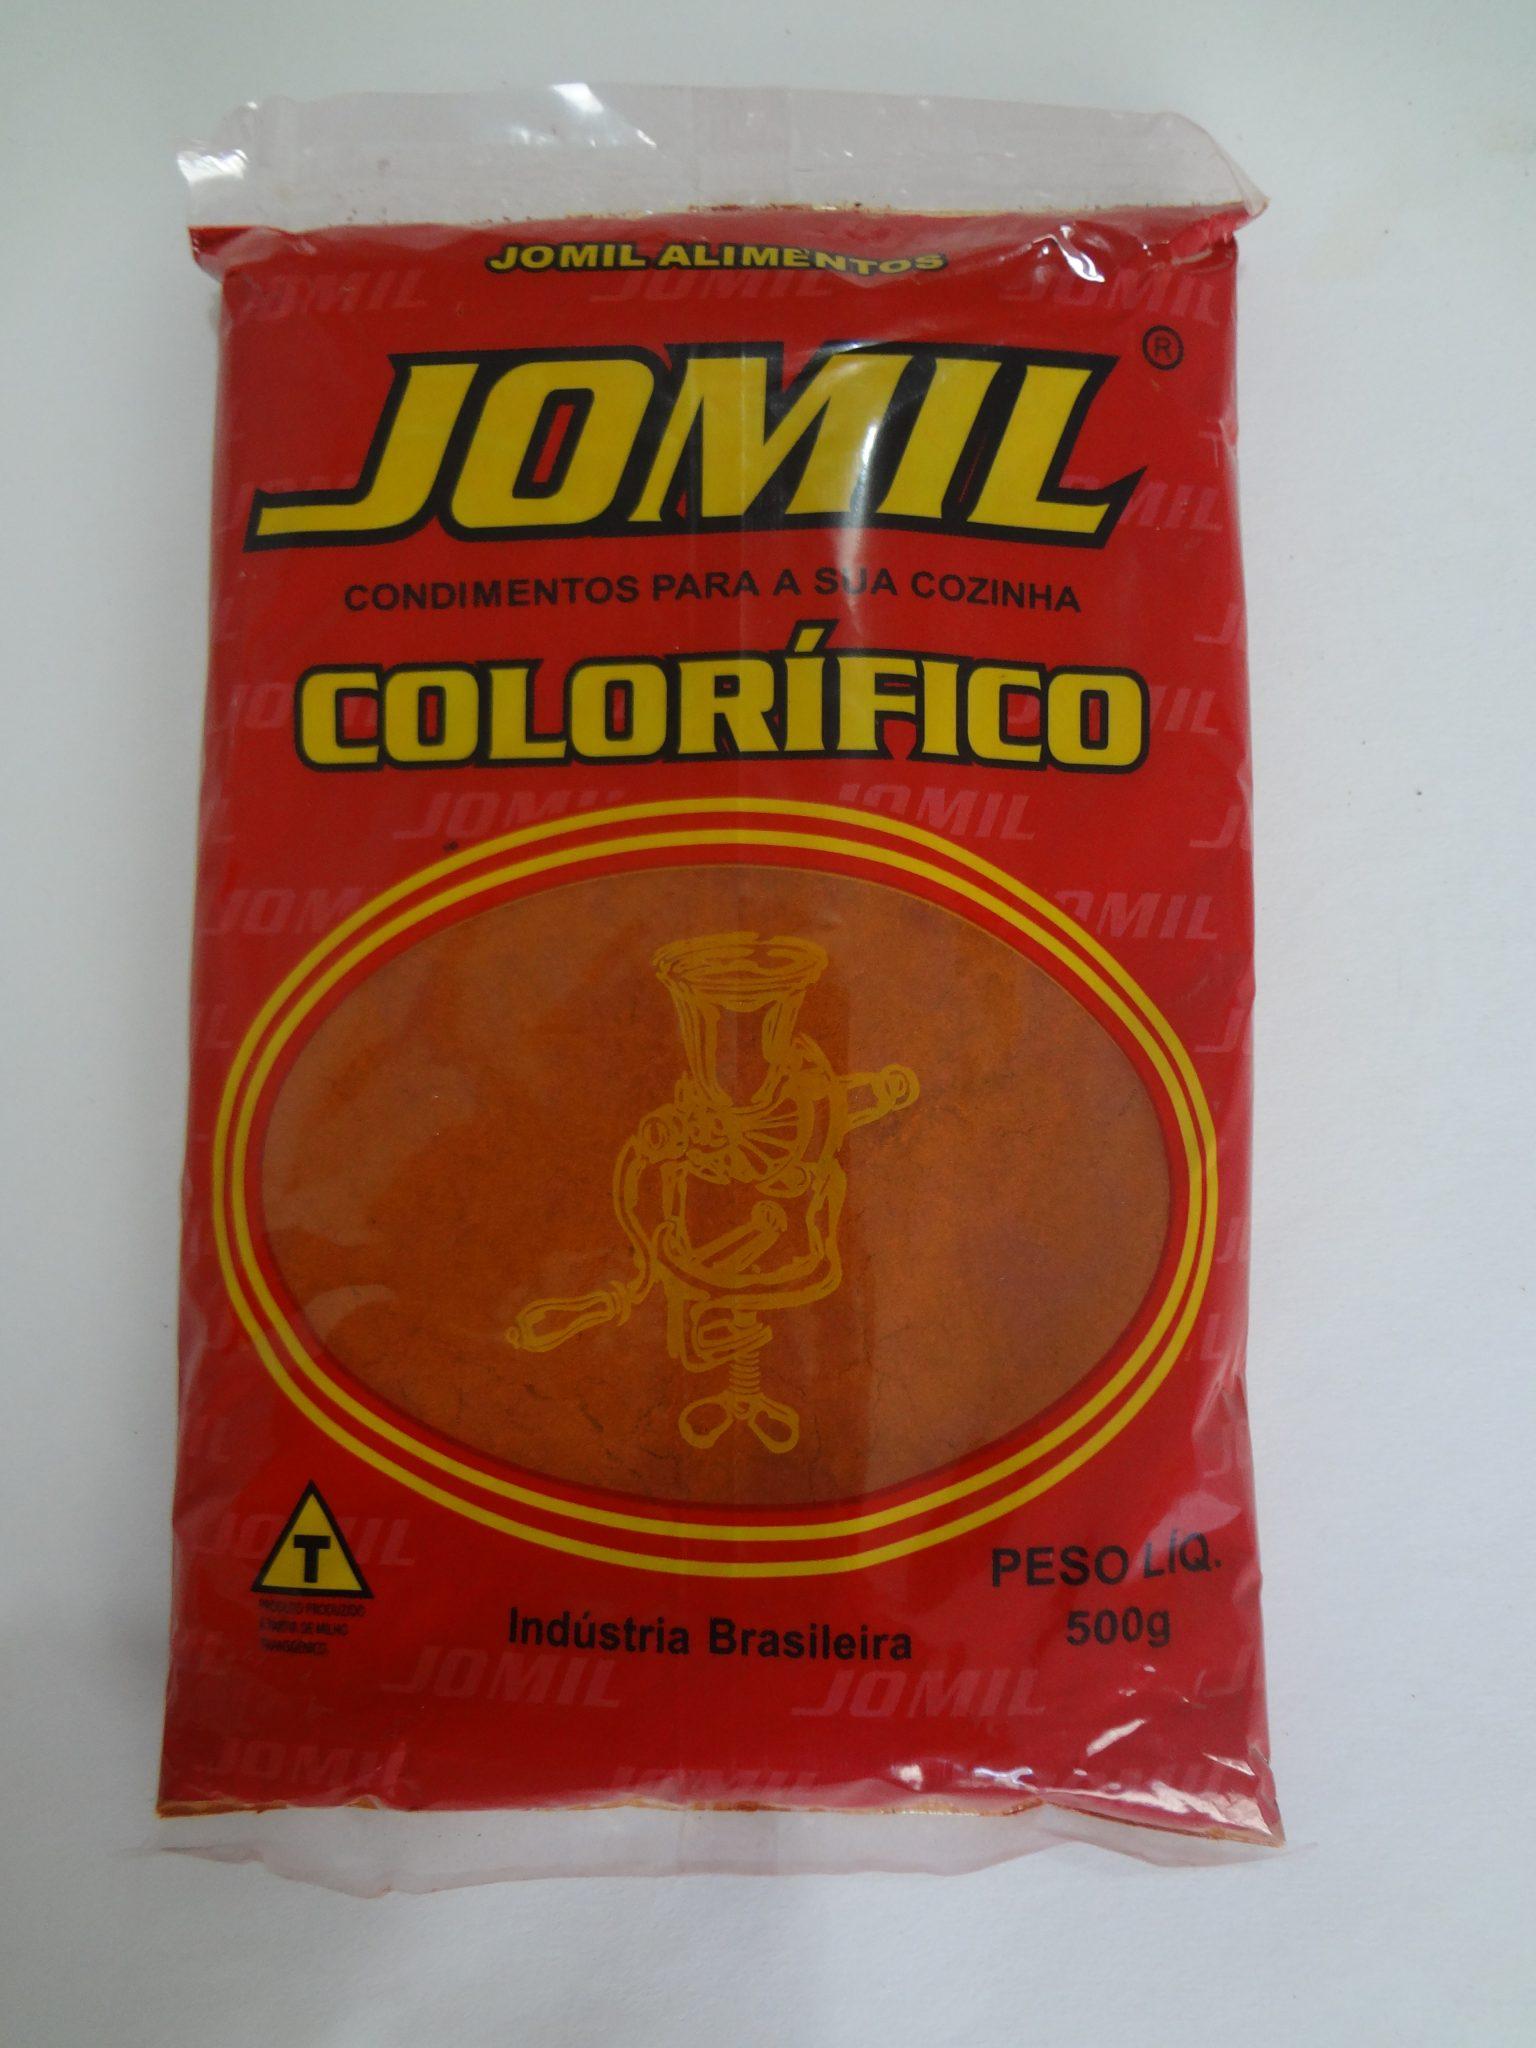 Colorífico 500g Jomil